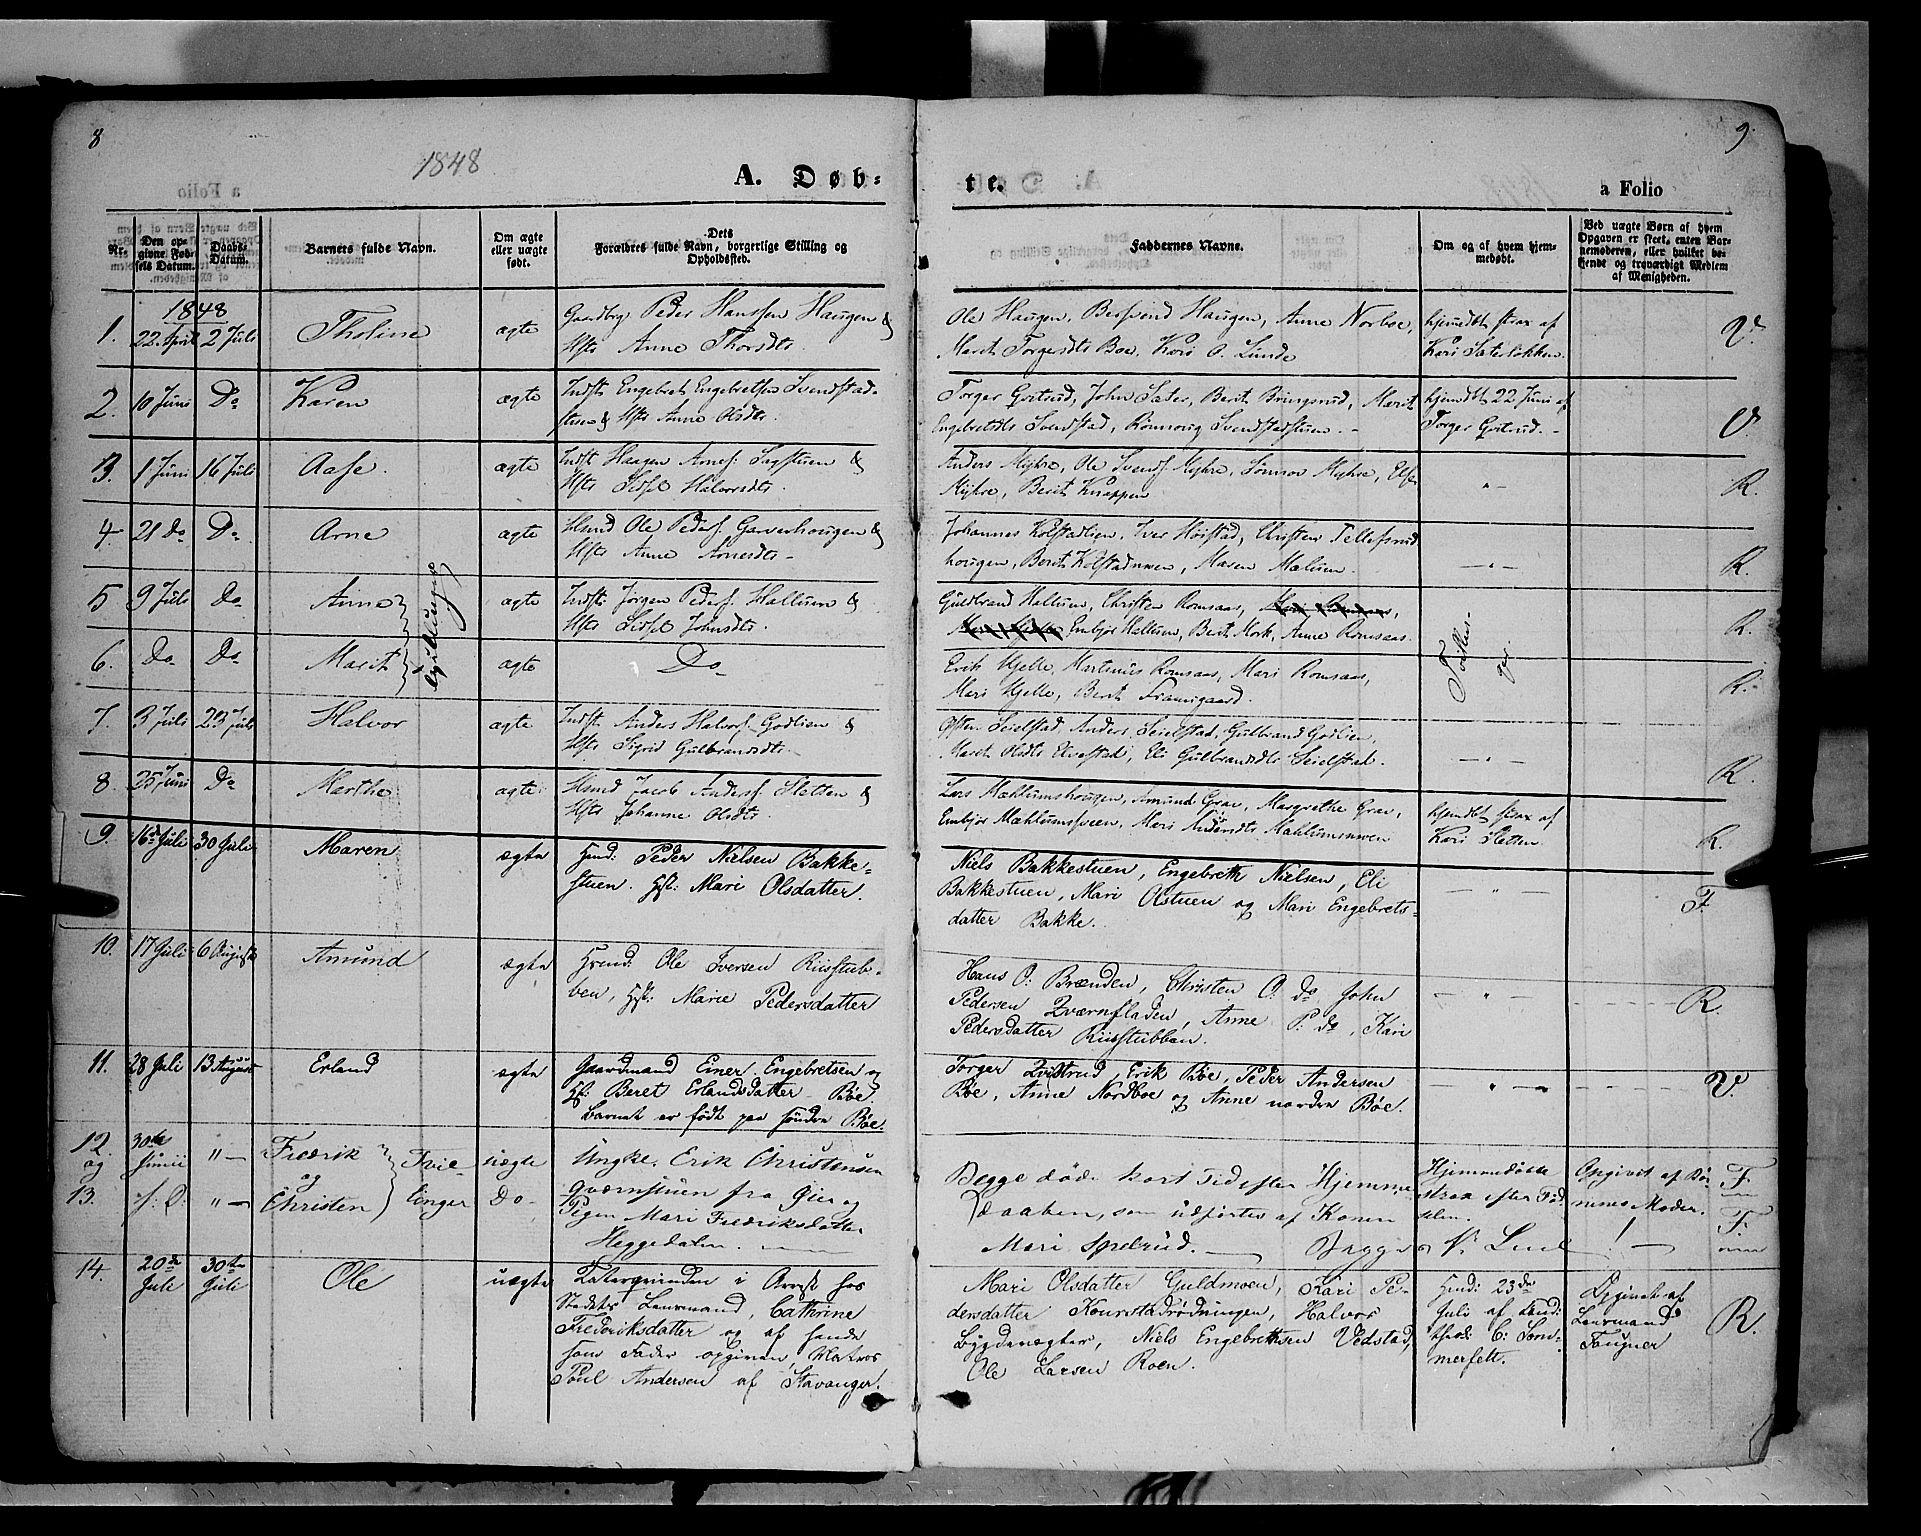 SAH, Ringebu prestekontor, Ministerialbok nr. 6, 1848-1859, s. 8-9